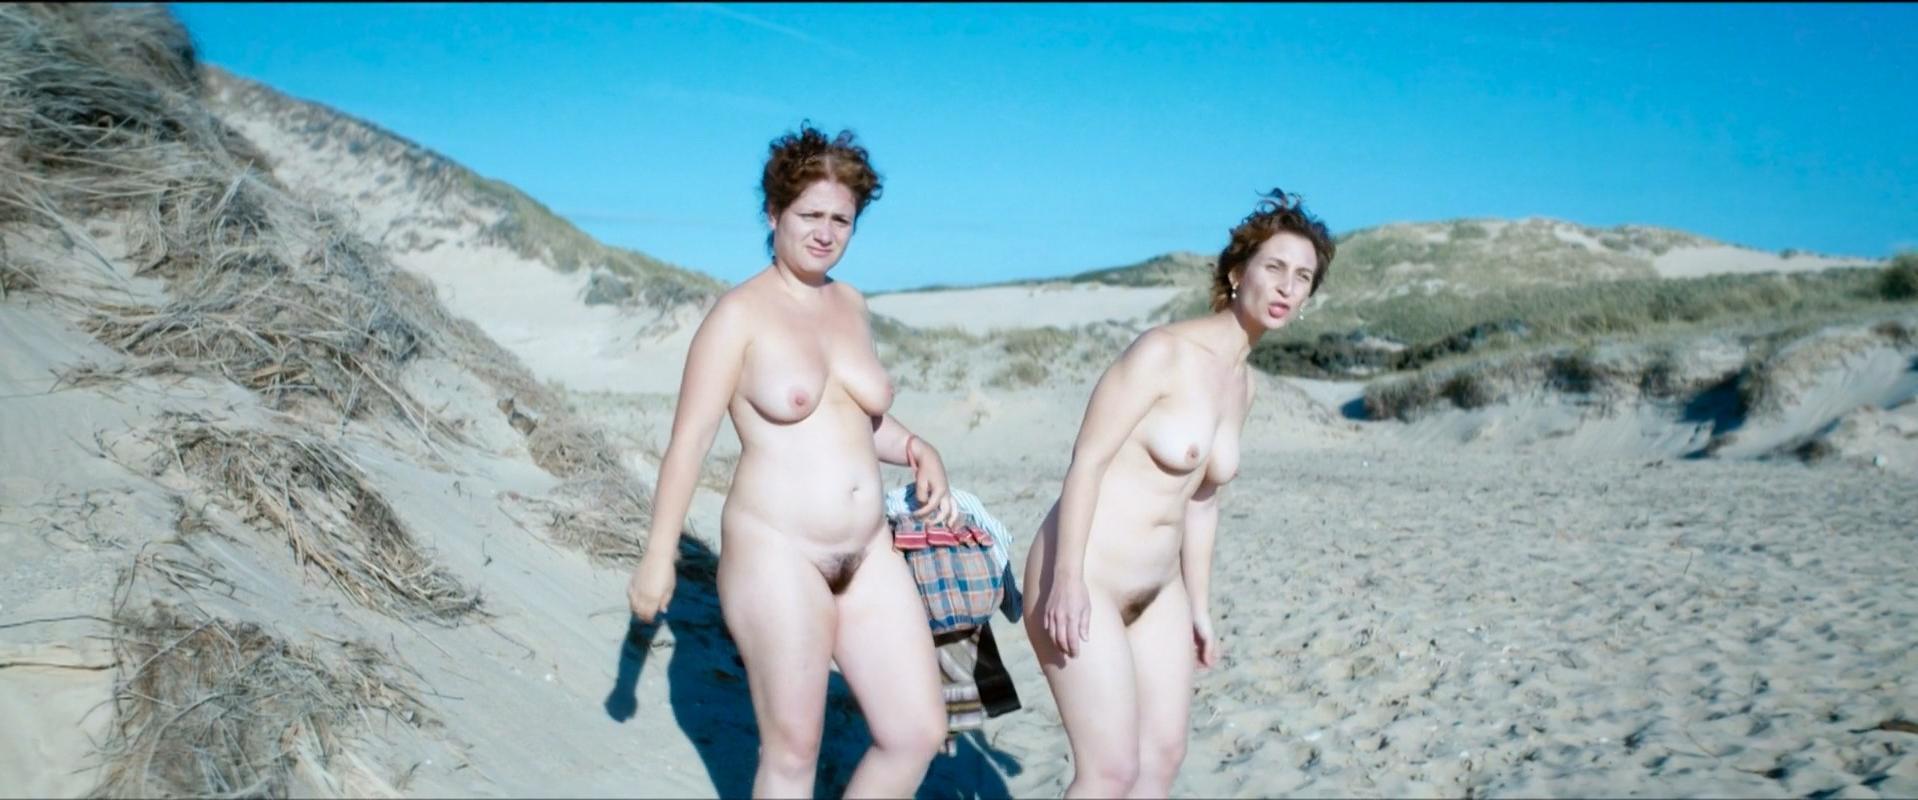 Laura Dupre nude, Angelique Vergara nude, Anna Zakharova nude - Ma Loute (2016)